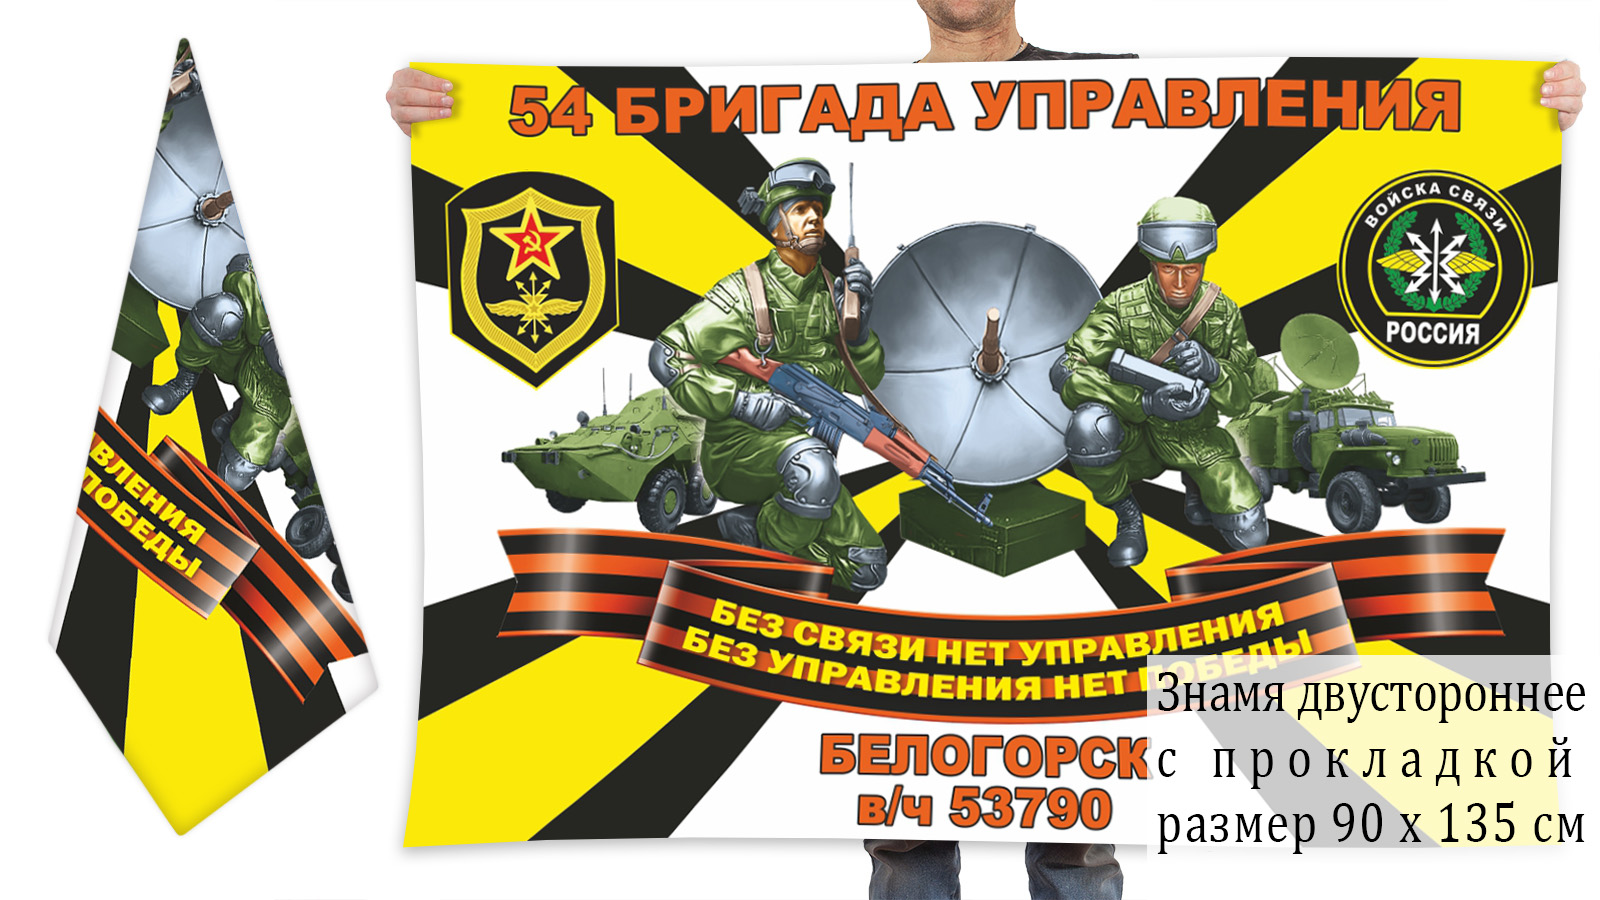 Двусторонний флаг 54 бригада управления войск связи